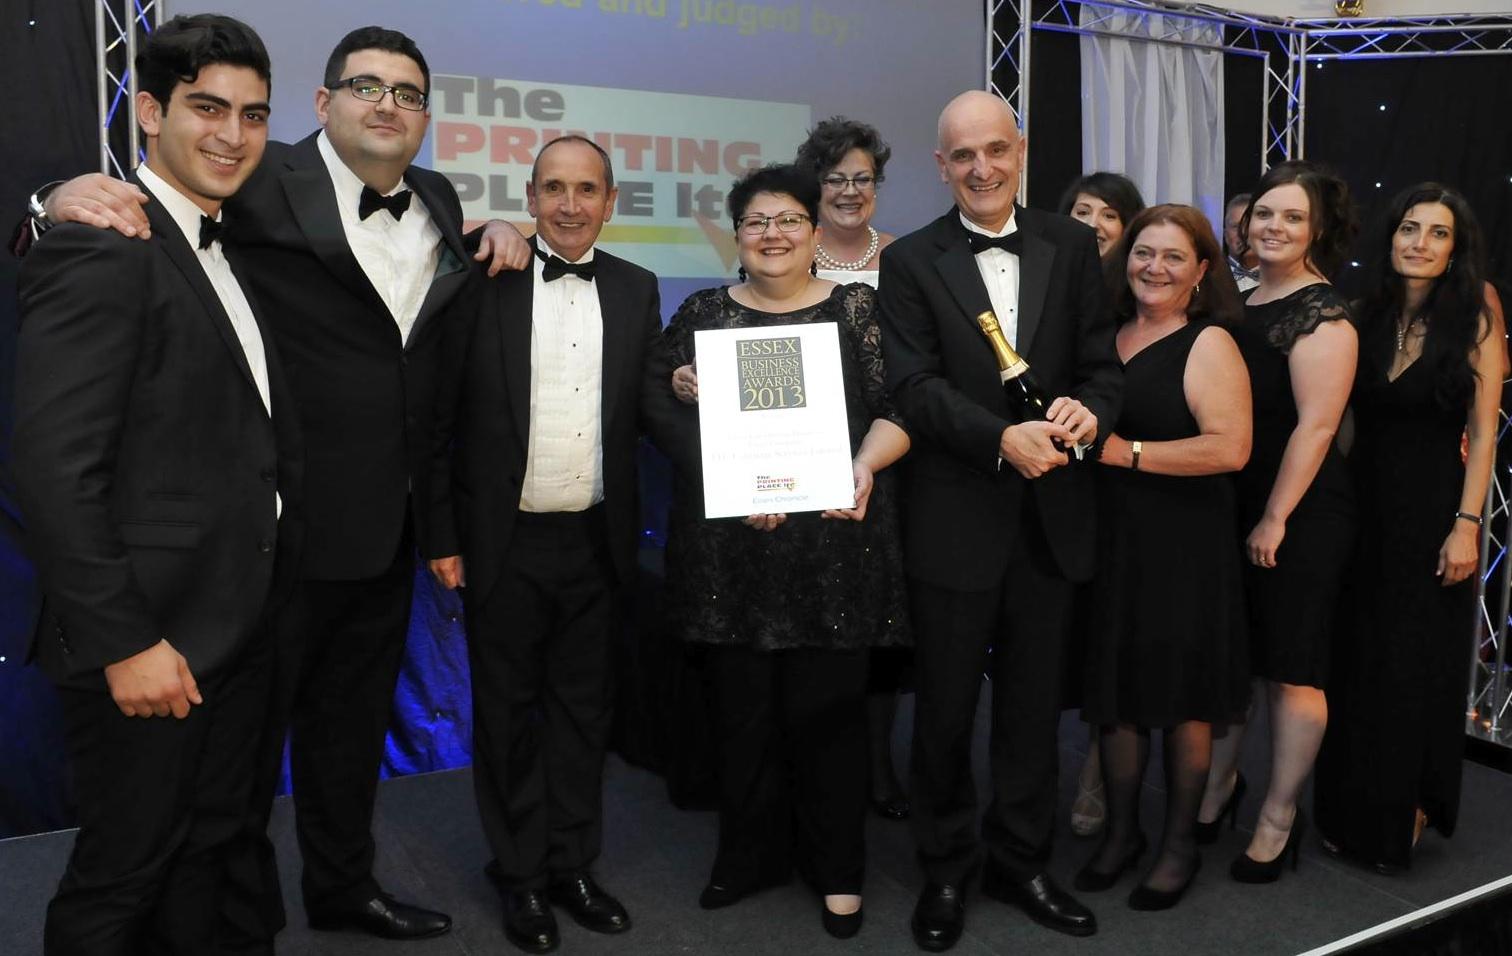 TTC wetranslate wins Essex Business Excellence Award